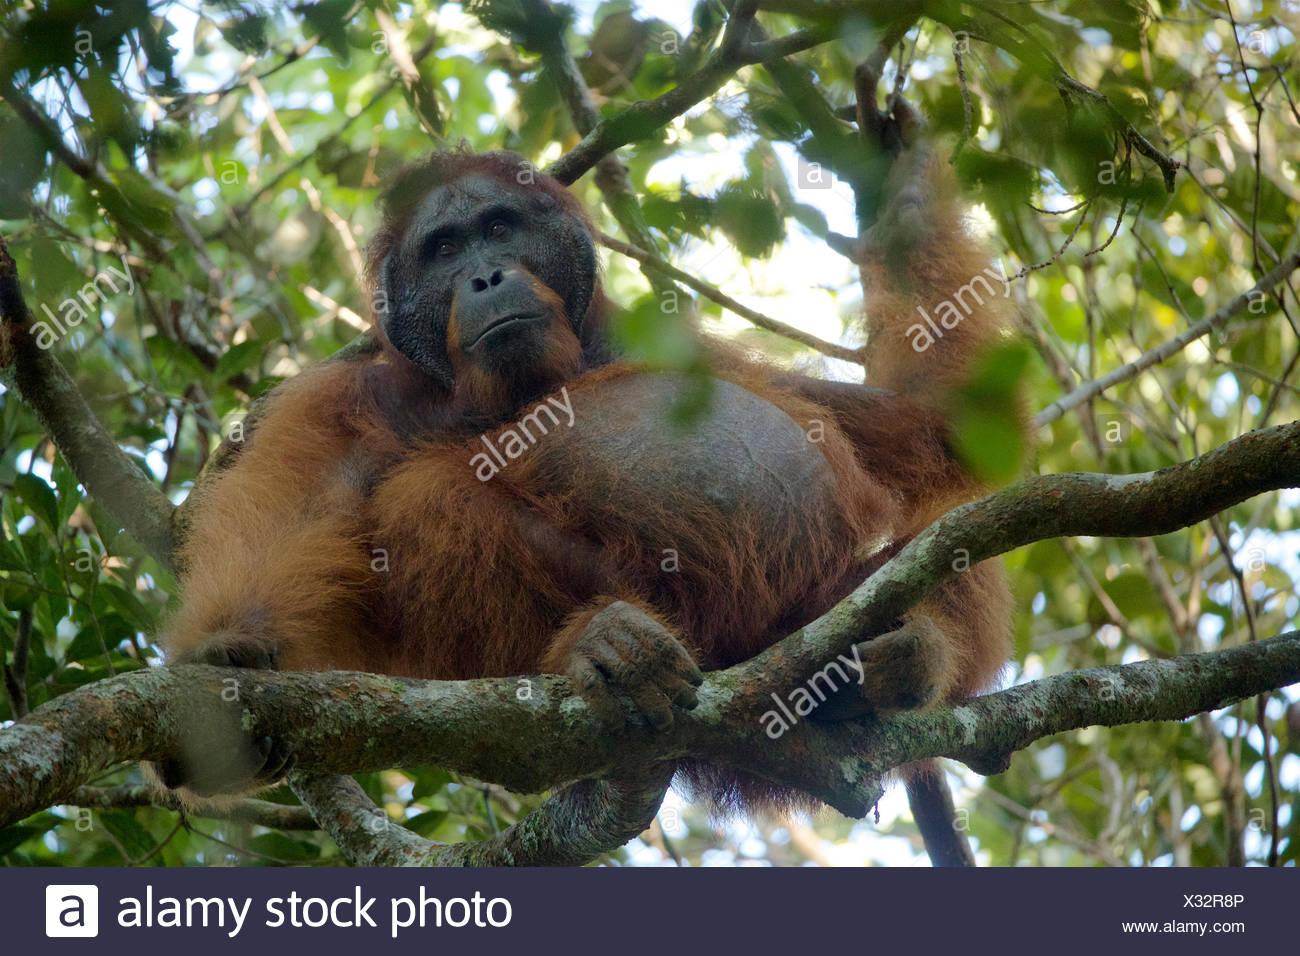 Un maschio adulto Bornean orangutan, pongo pygmaeus wurmbii, poggia su un ramo di albero in Gunung Palung National Park. Immagini Stock